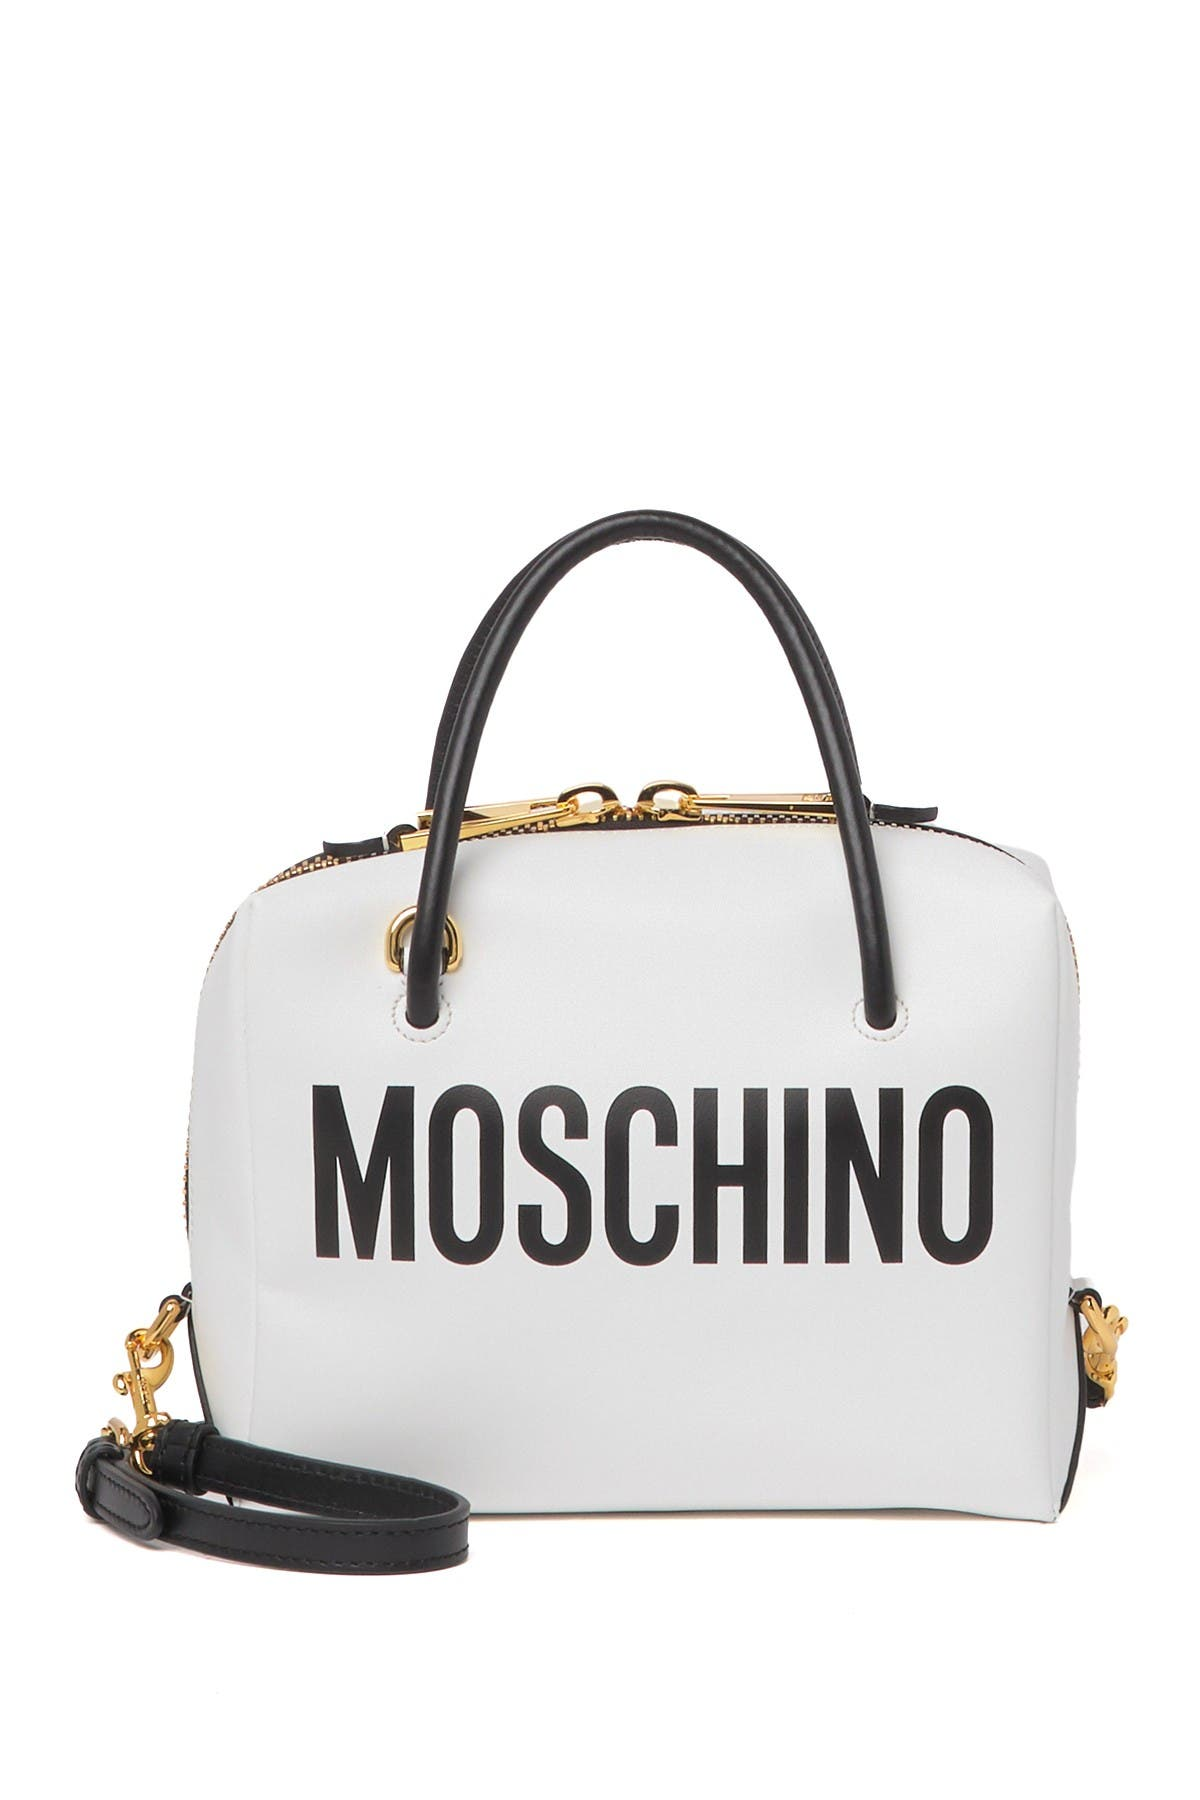 Image of MOSCHINO Logo Leather Shoulder Crossbody Bag